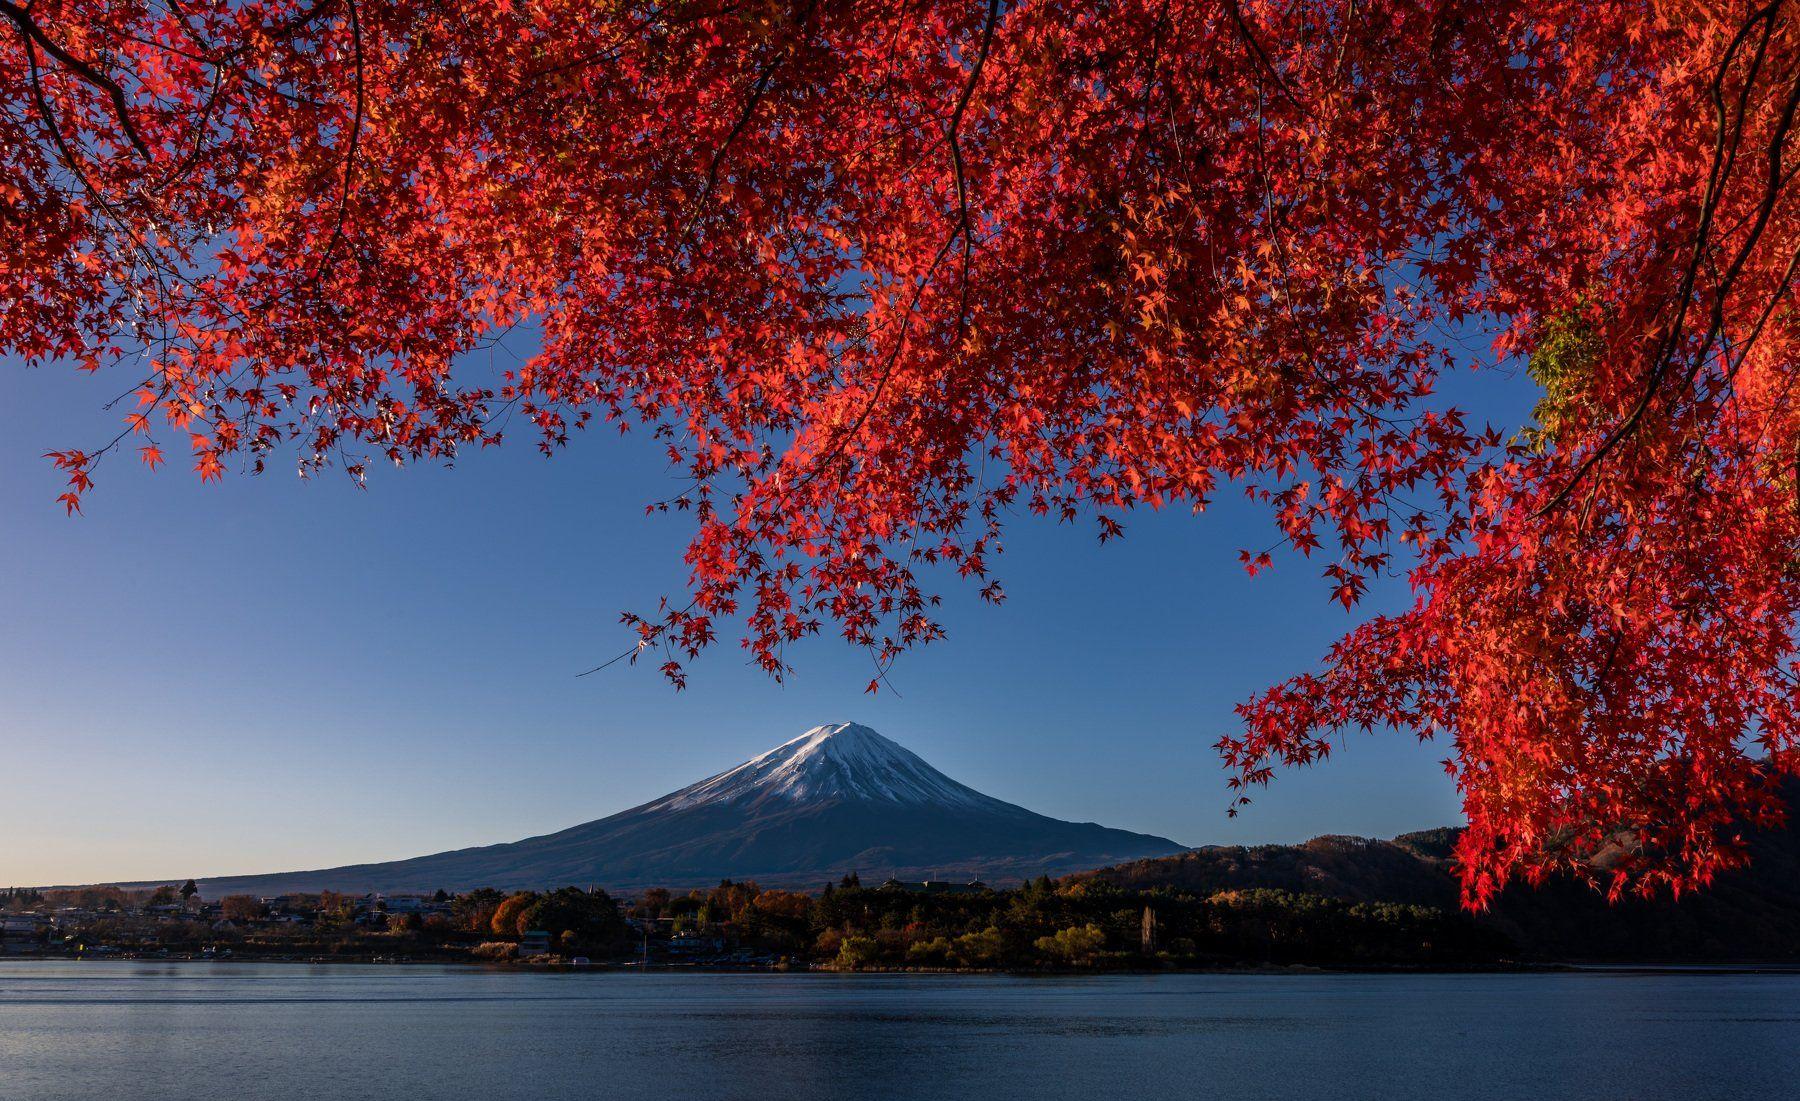 fuji landscape japan autumn nature mountain lake travel, Hasan Jakaria